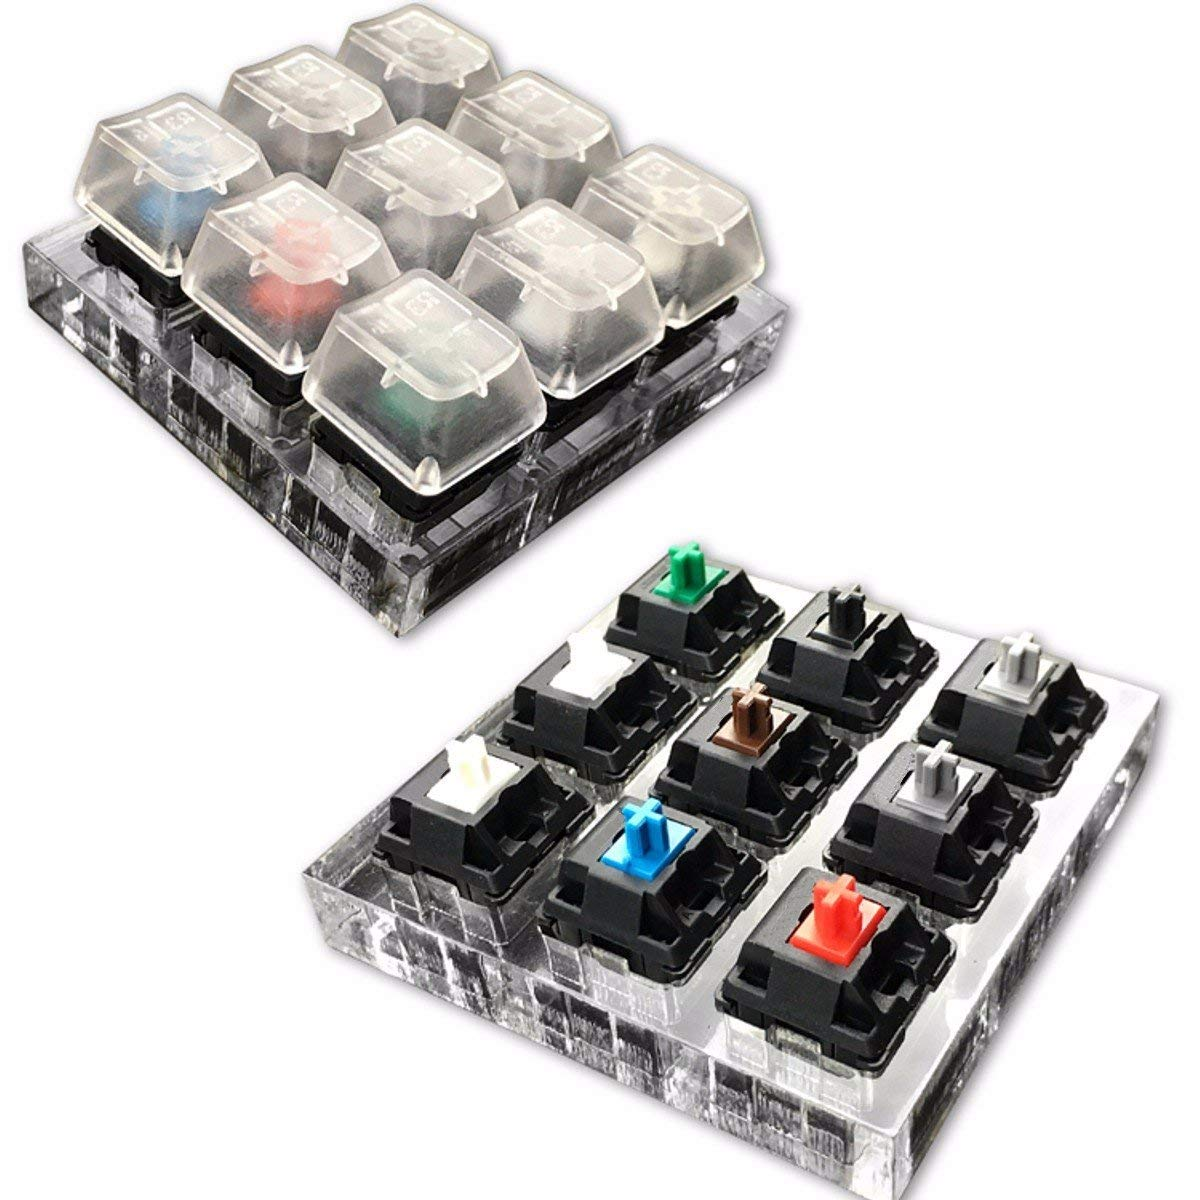 Buy KBDfans Mechanical keyboard Super Swith Tester 63